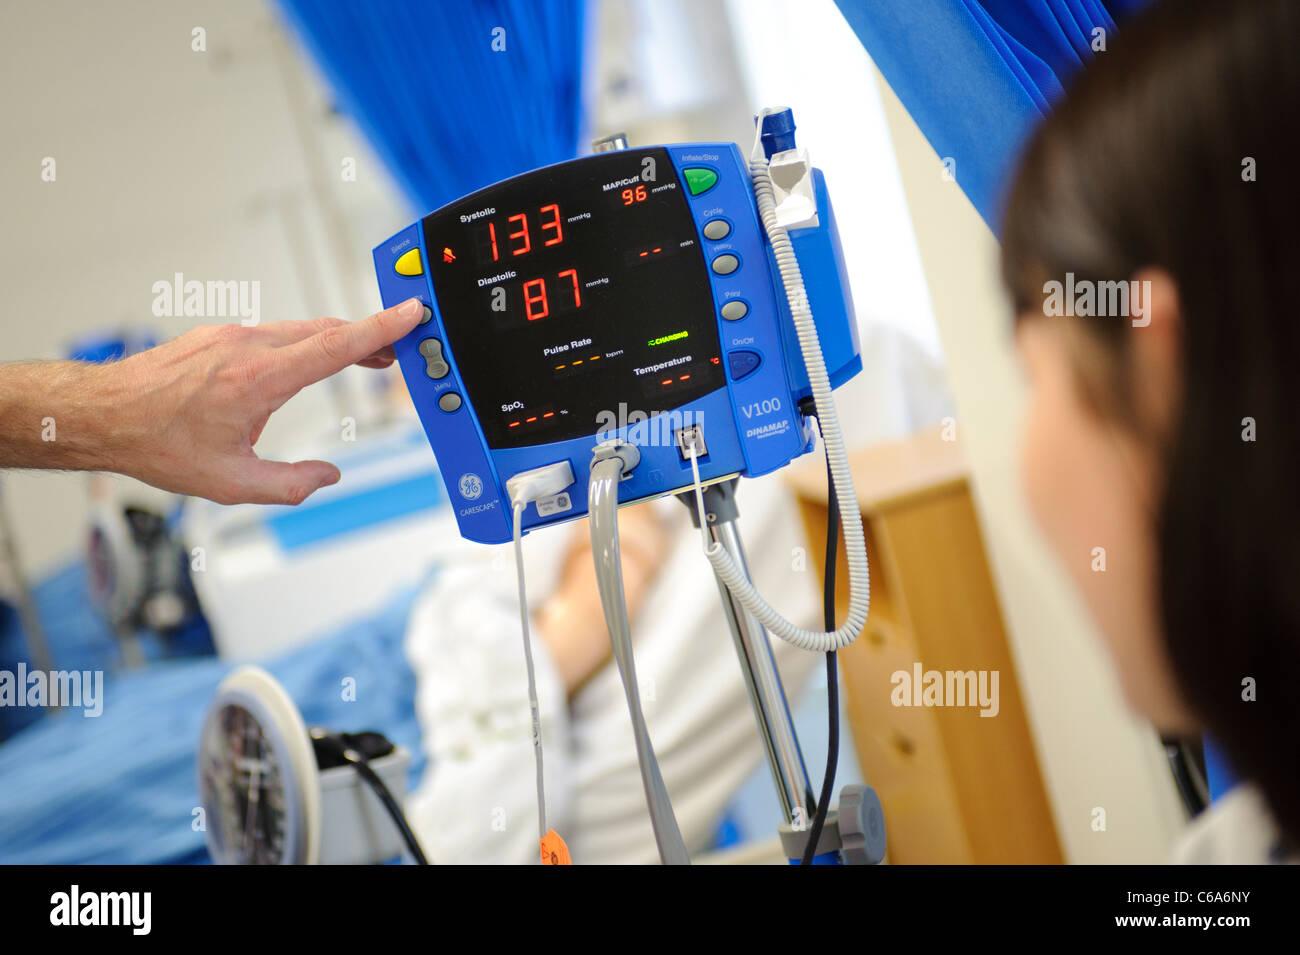 Blood Pressure And Pulse Monitor Machine Hospital Ward Manual Guide